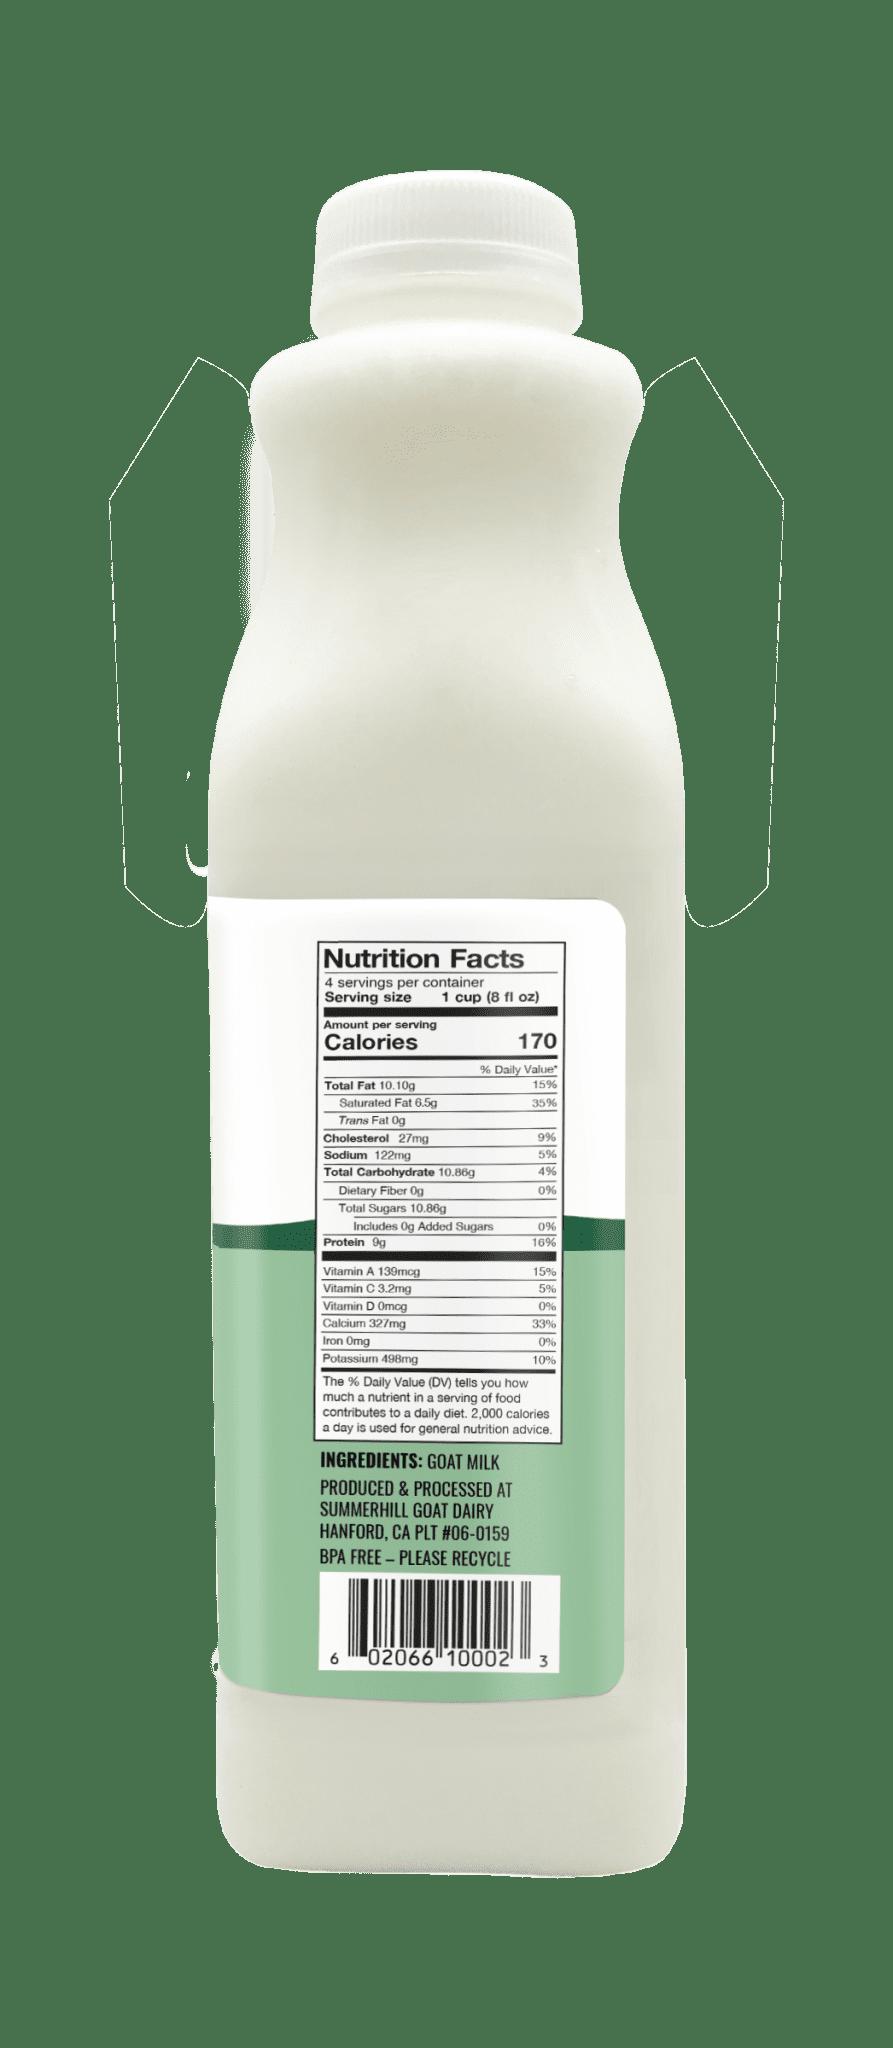 Summerhill dairy goat milk 32oz nutrition facts